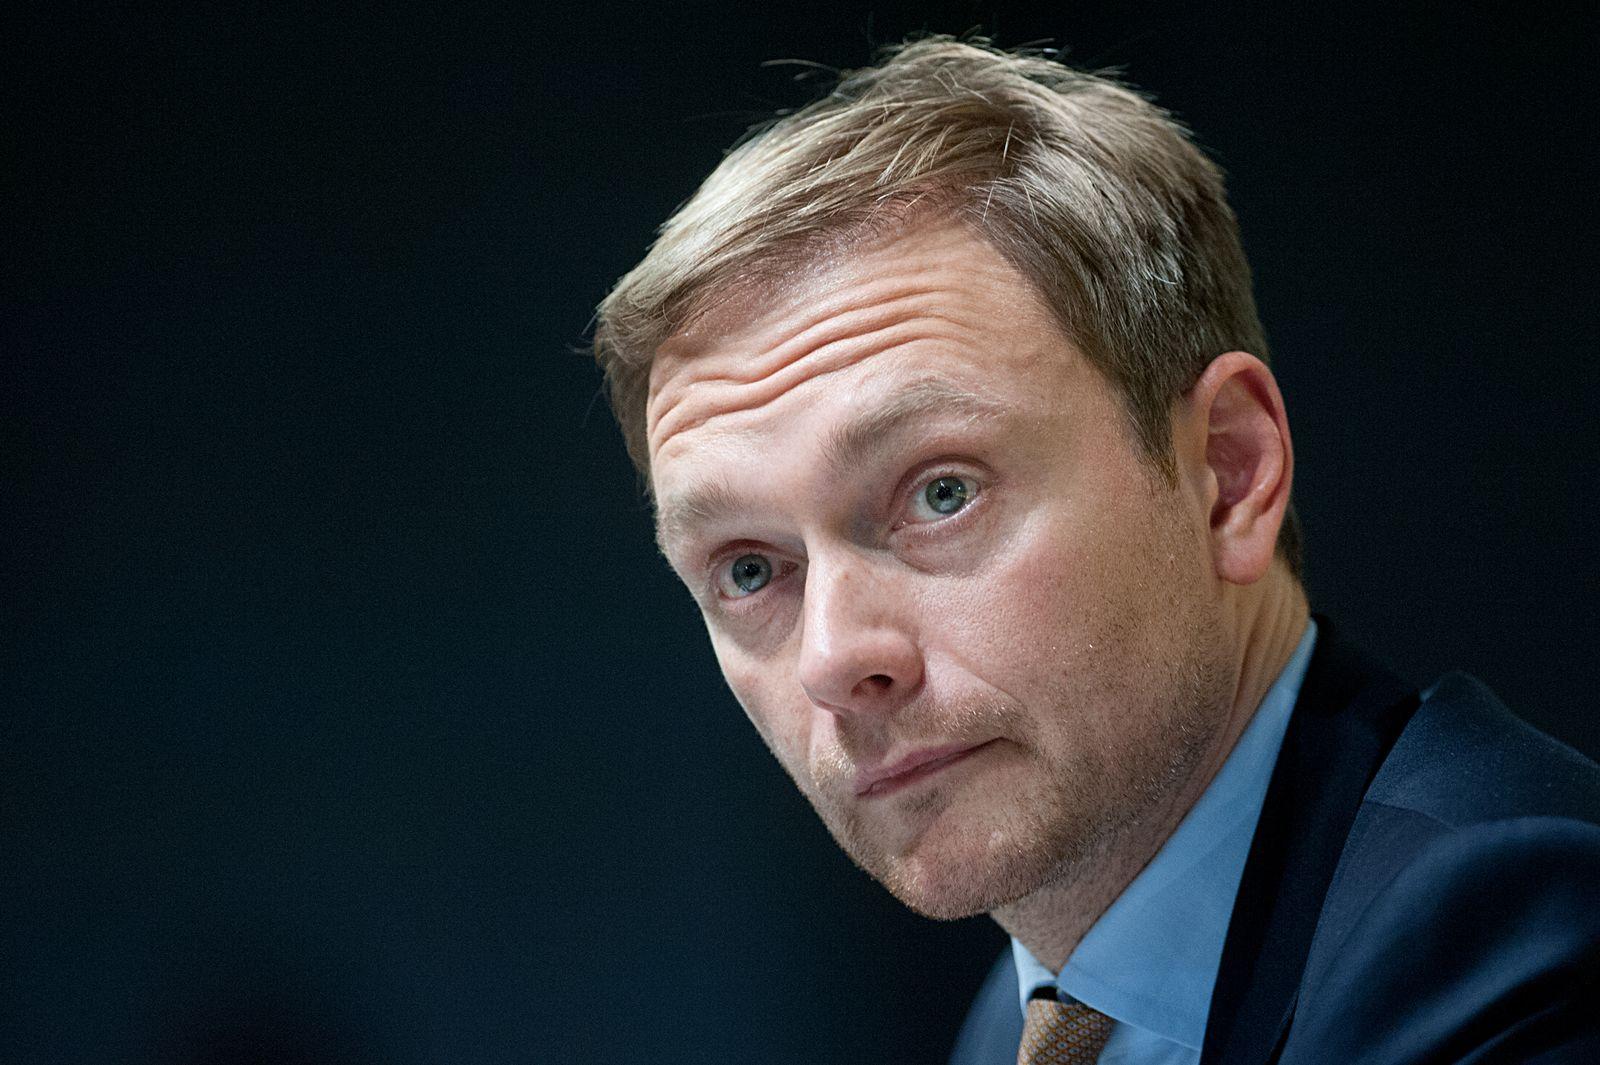 Bilderberg/ Lindner